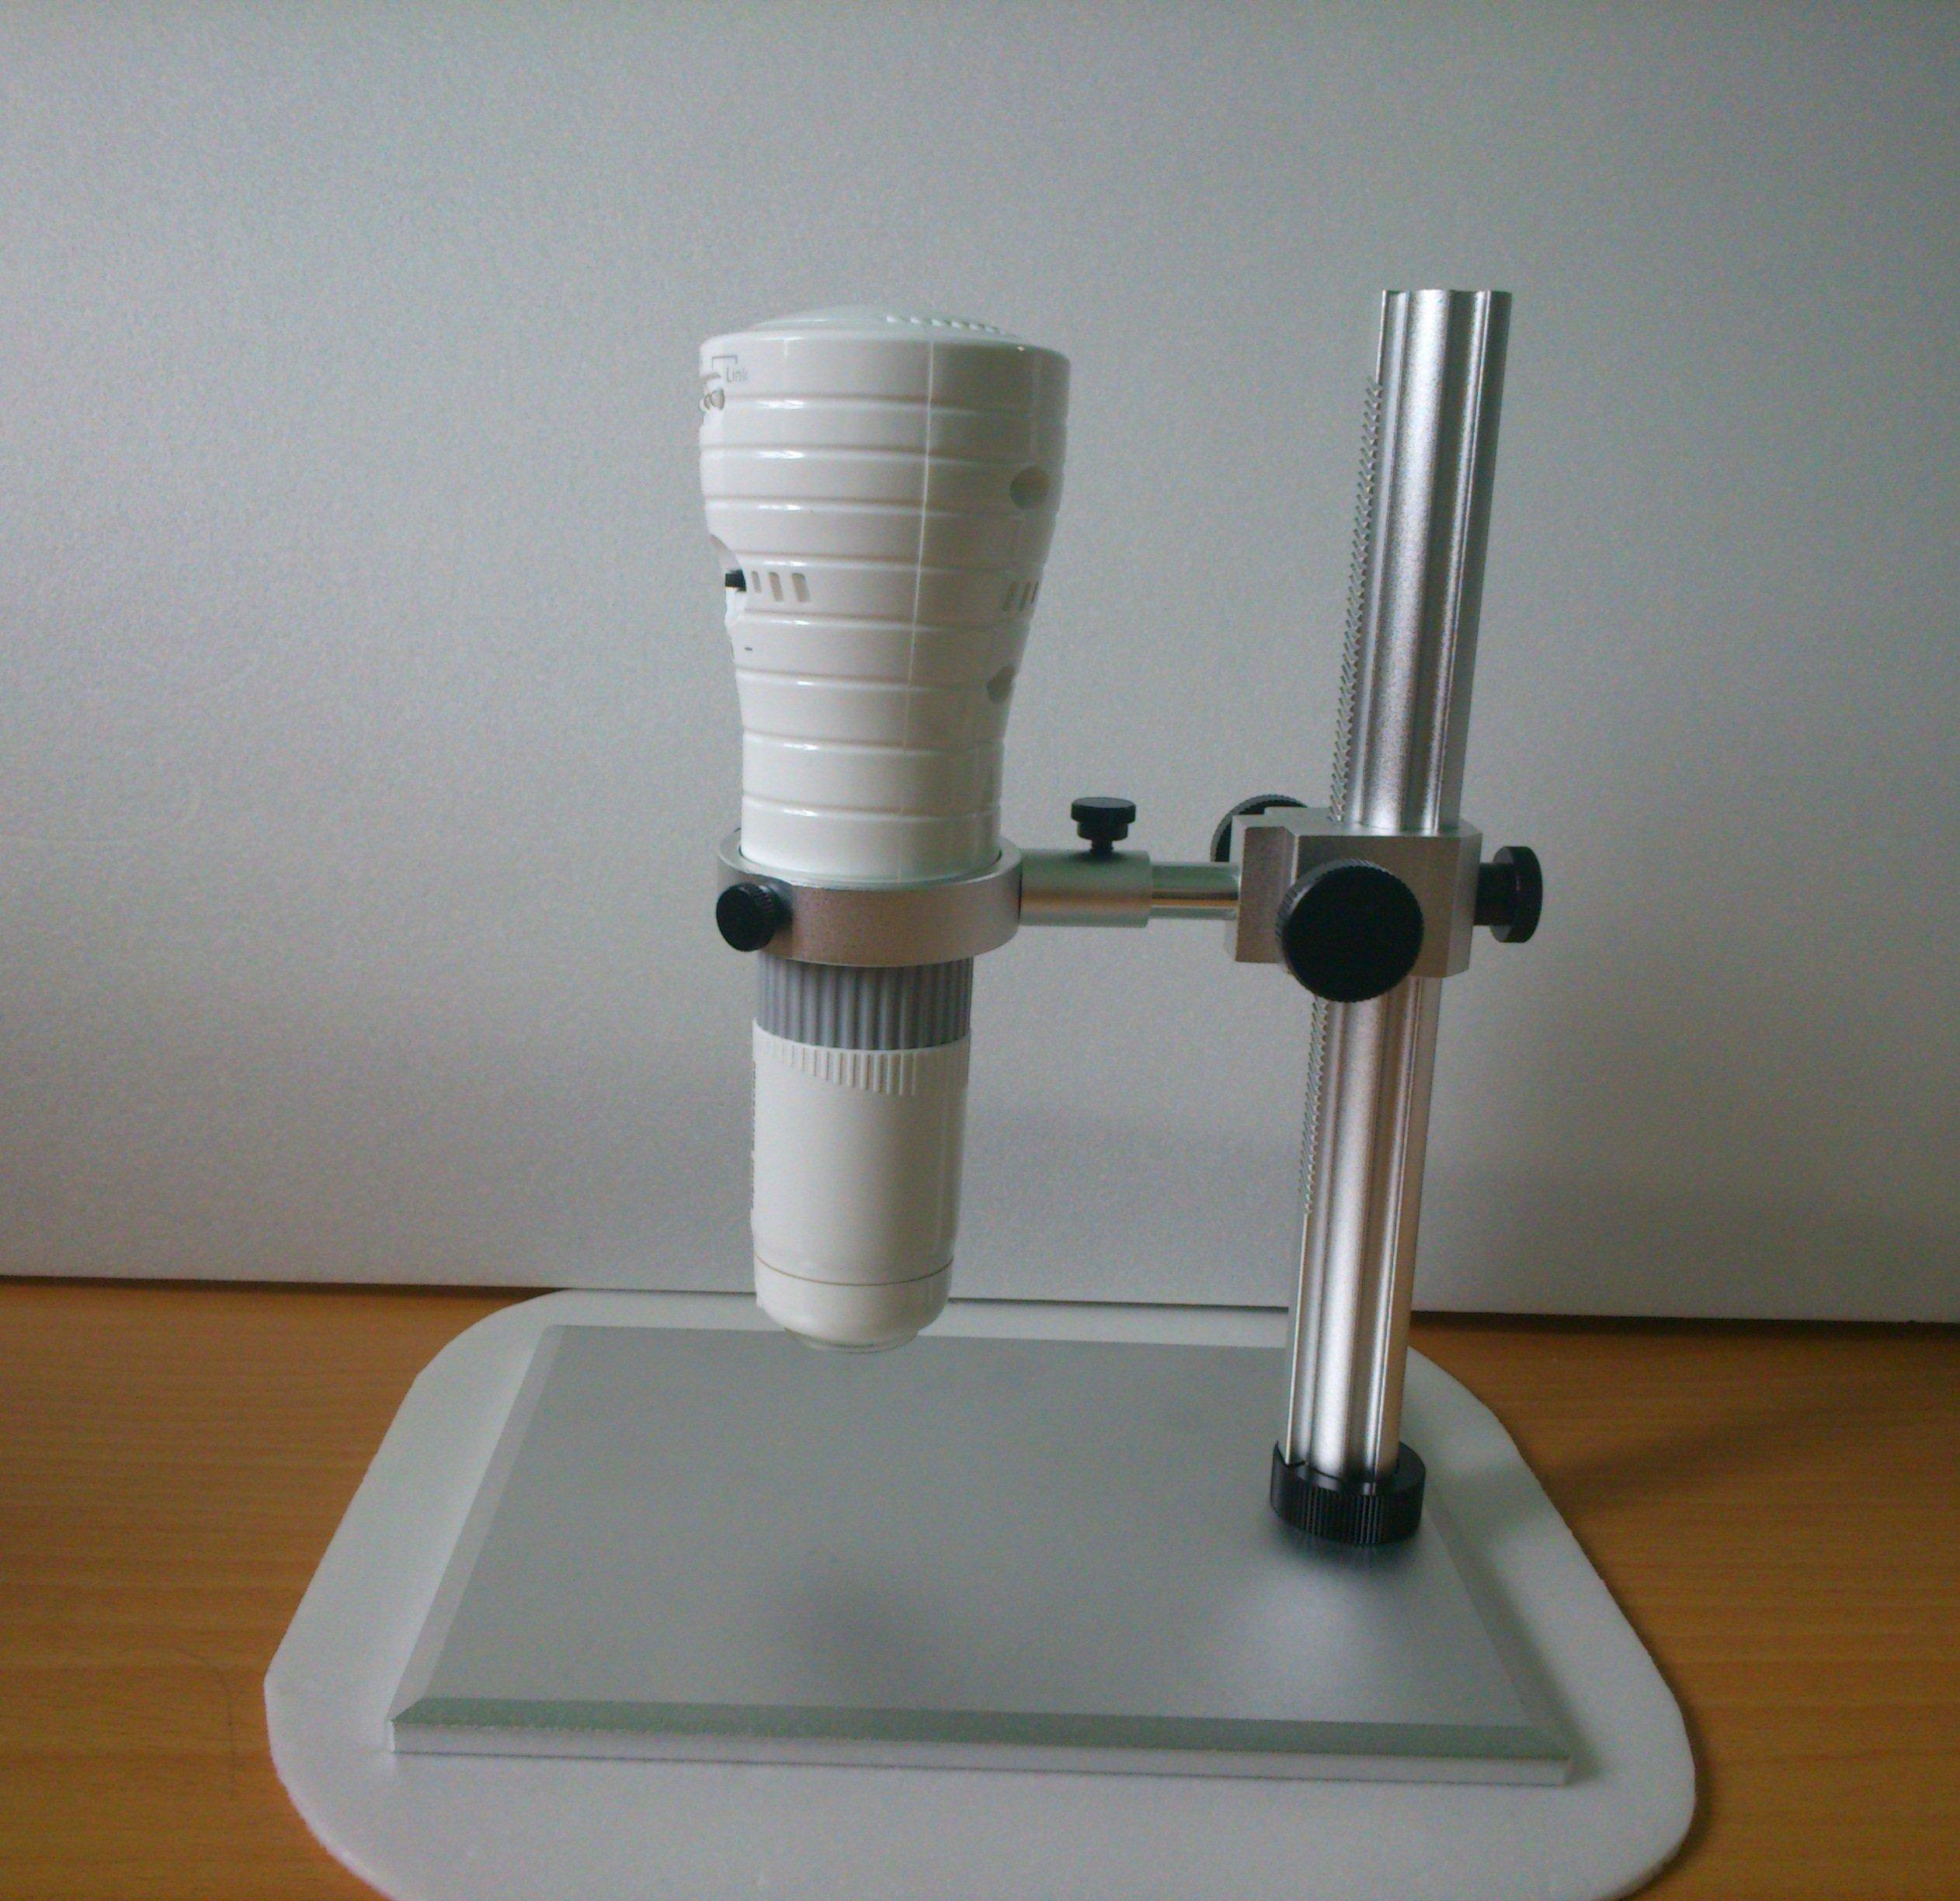 Vividia Wi-Fi Wireless Handheld Digital Microscope for iPhone/iPad/iPod Touch by Vividia